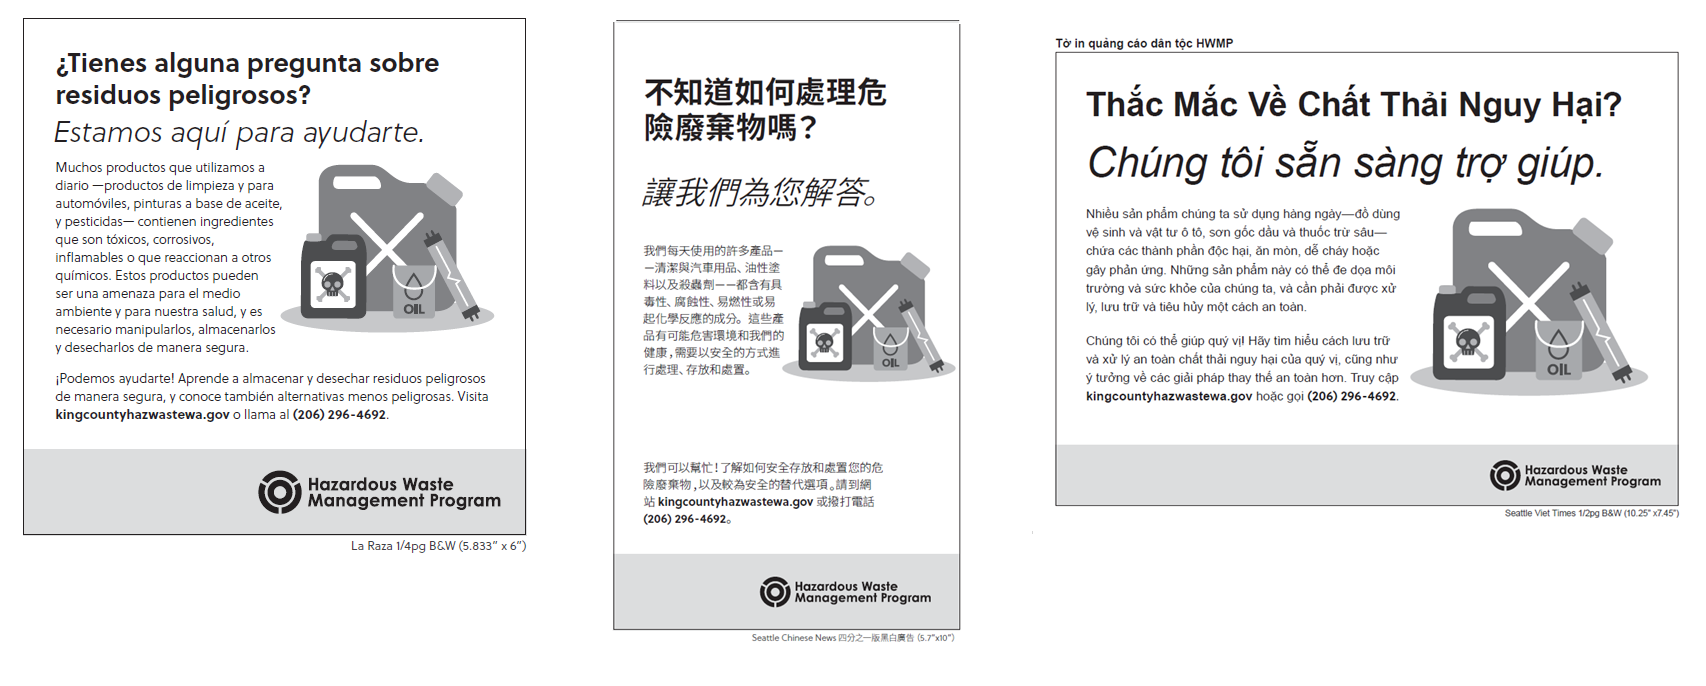 2020-GFKC-Translated-Ads